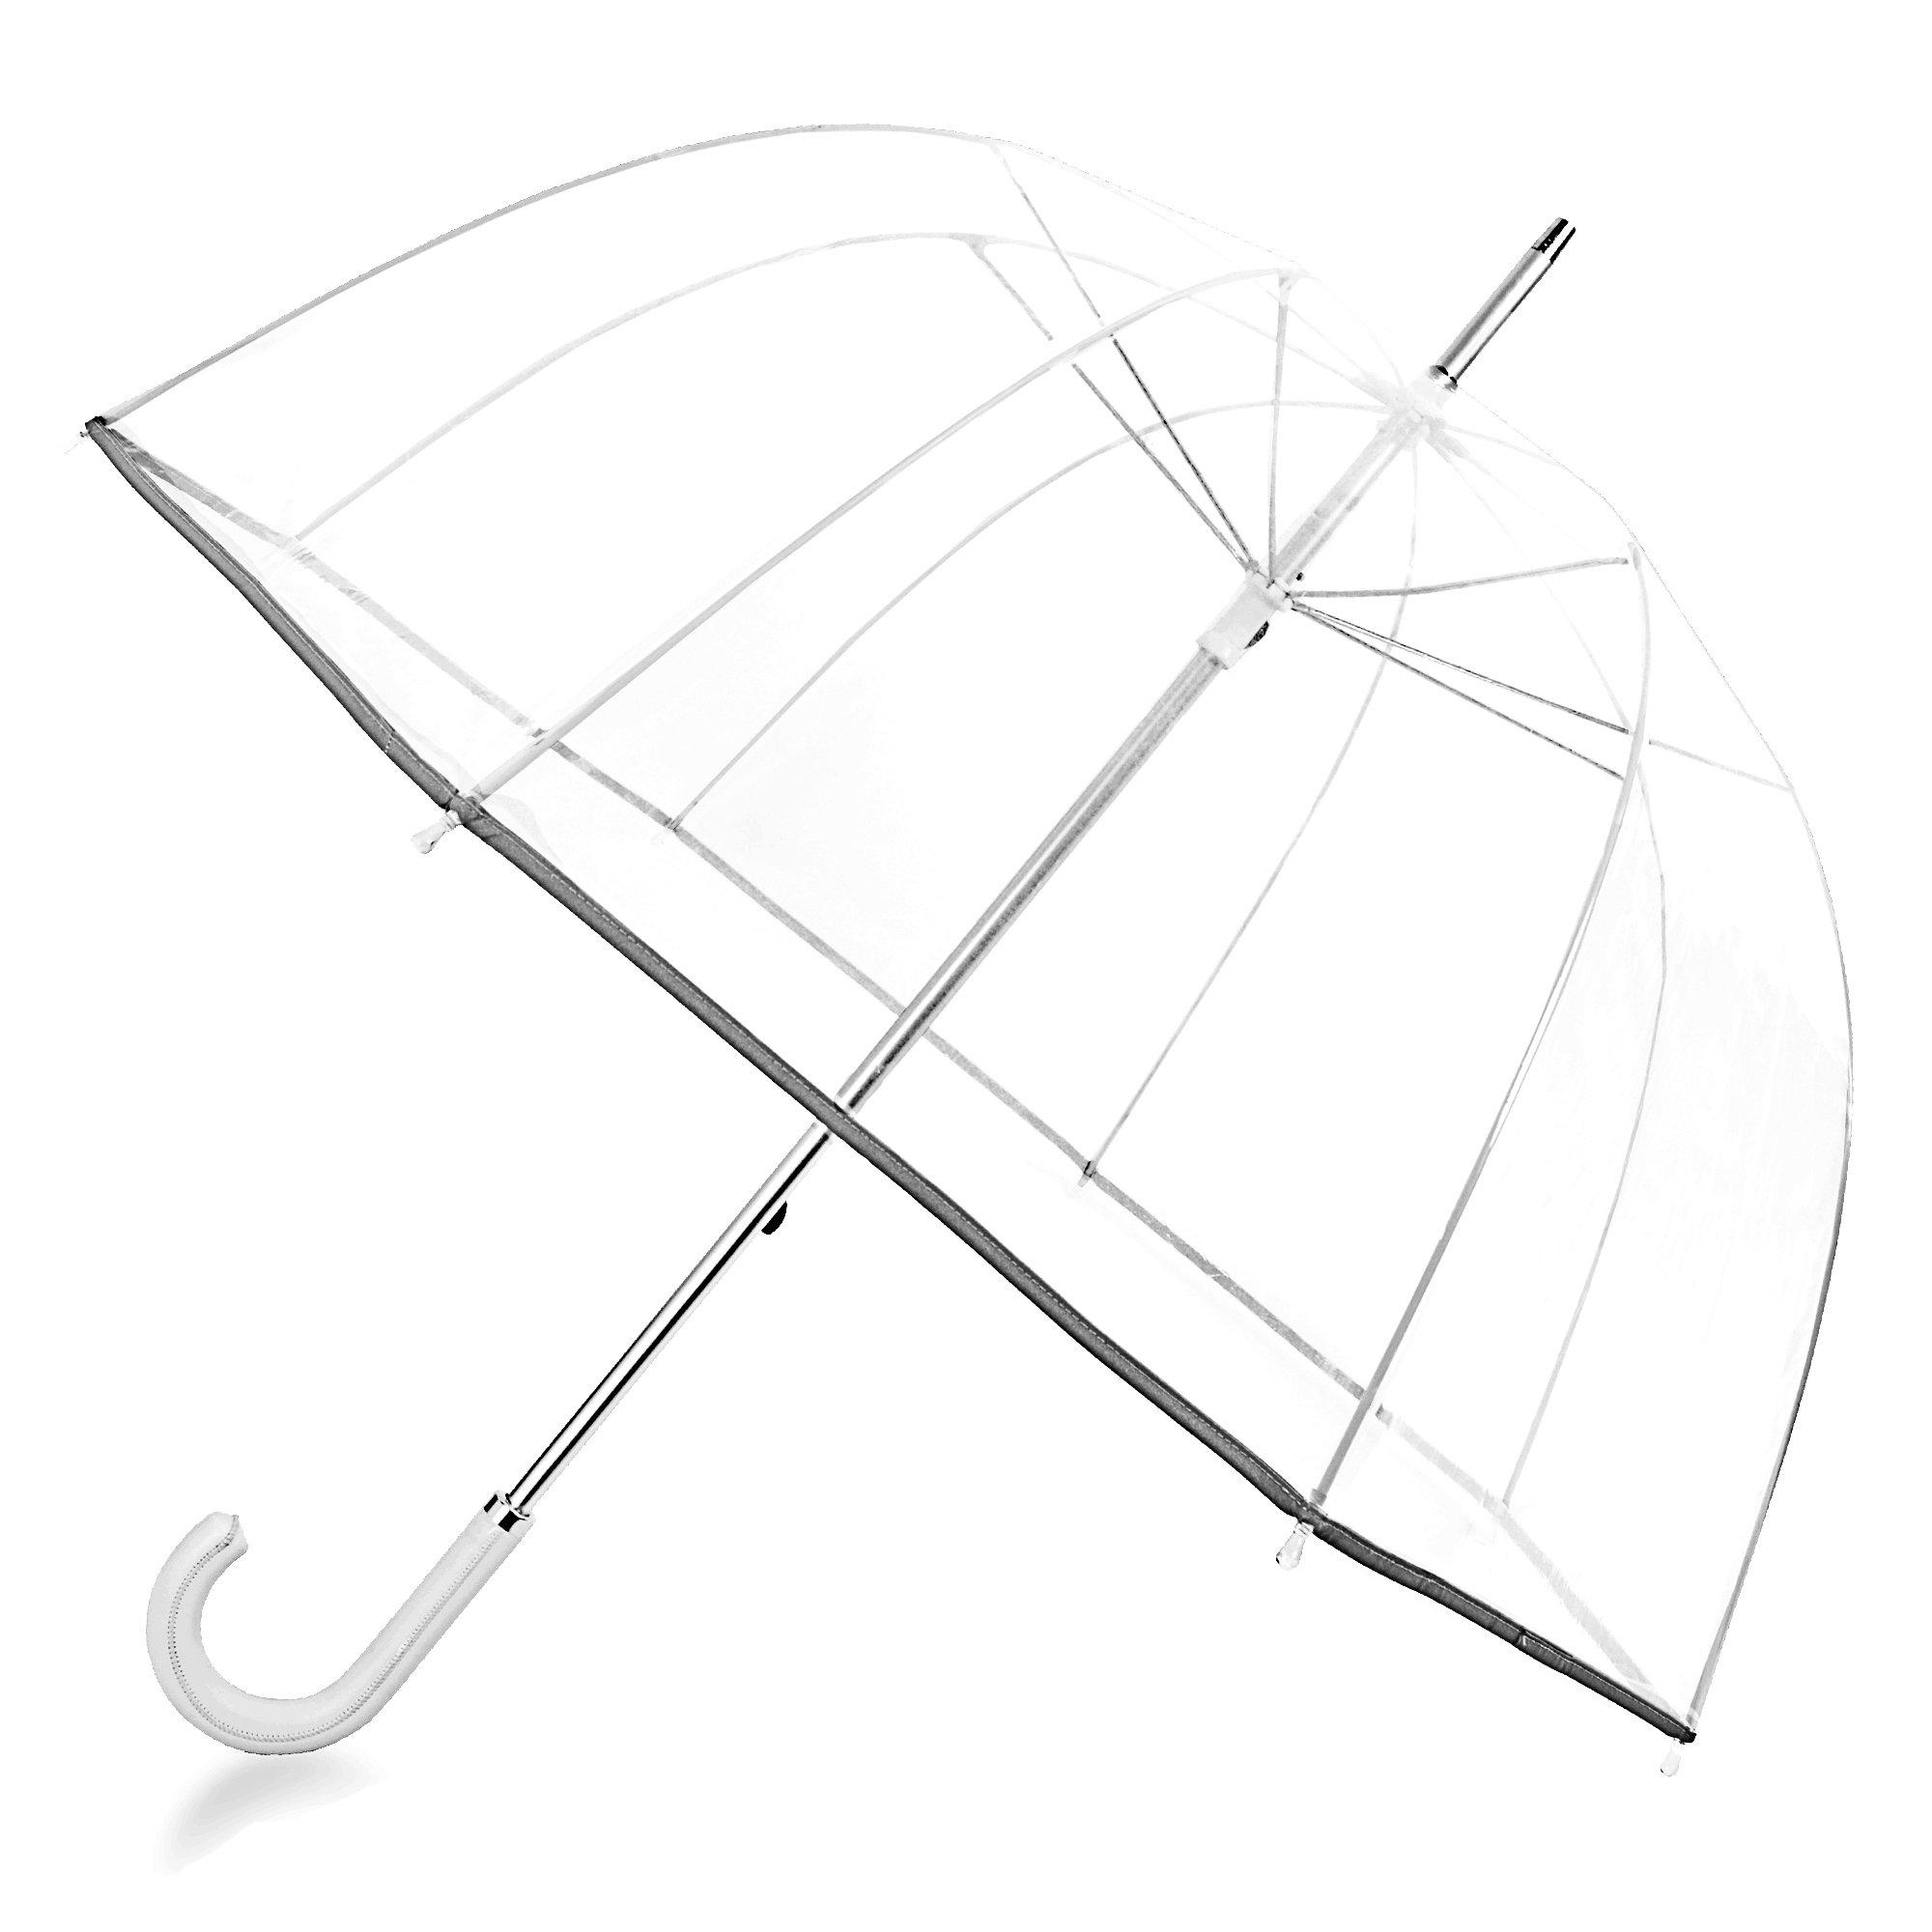 Kung Fu Smith 52 Inch Bubble Clear Umbrella for Weddings, Bulk Large Adult Windproof Dome Rain Umbrella